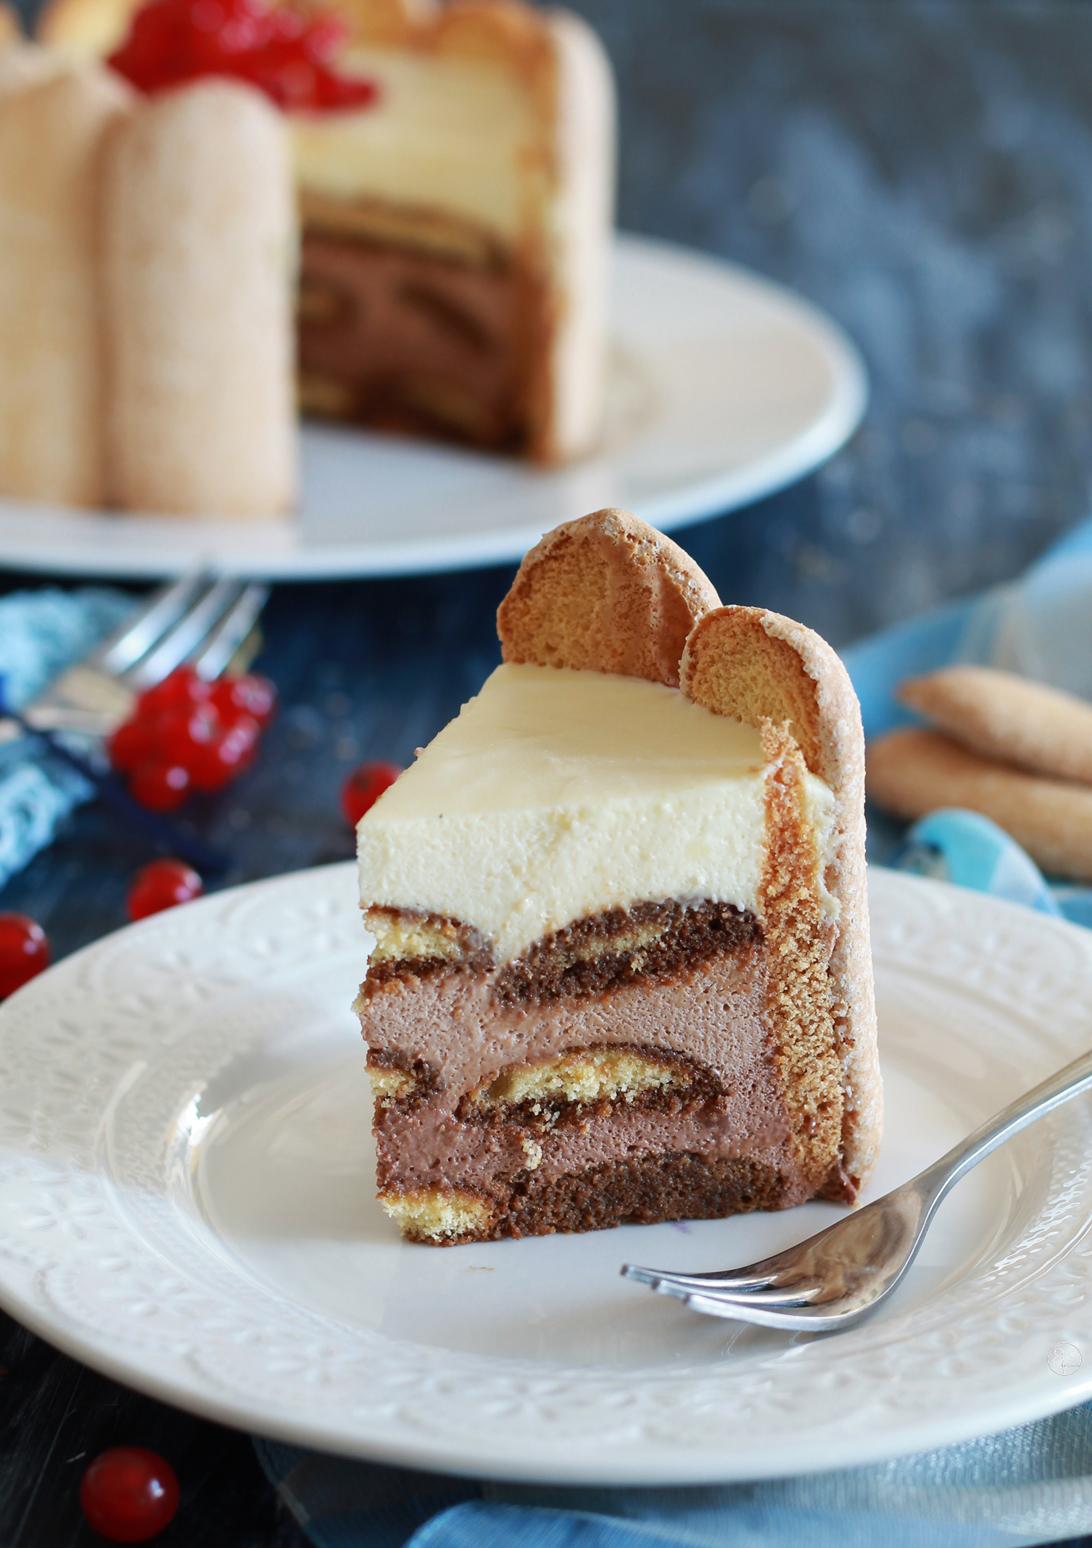 Charlotte senza glutine ai tre cioccolati - La Cassata Celiaca